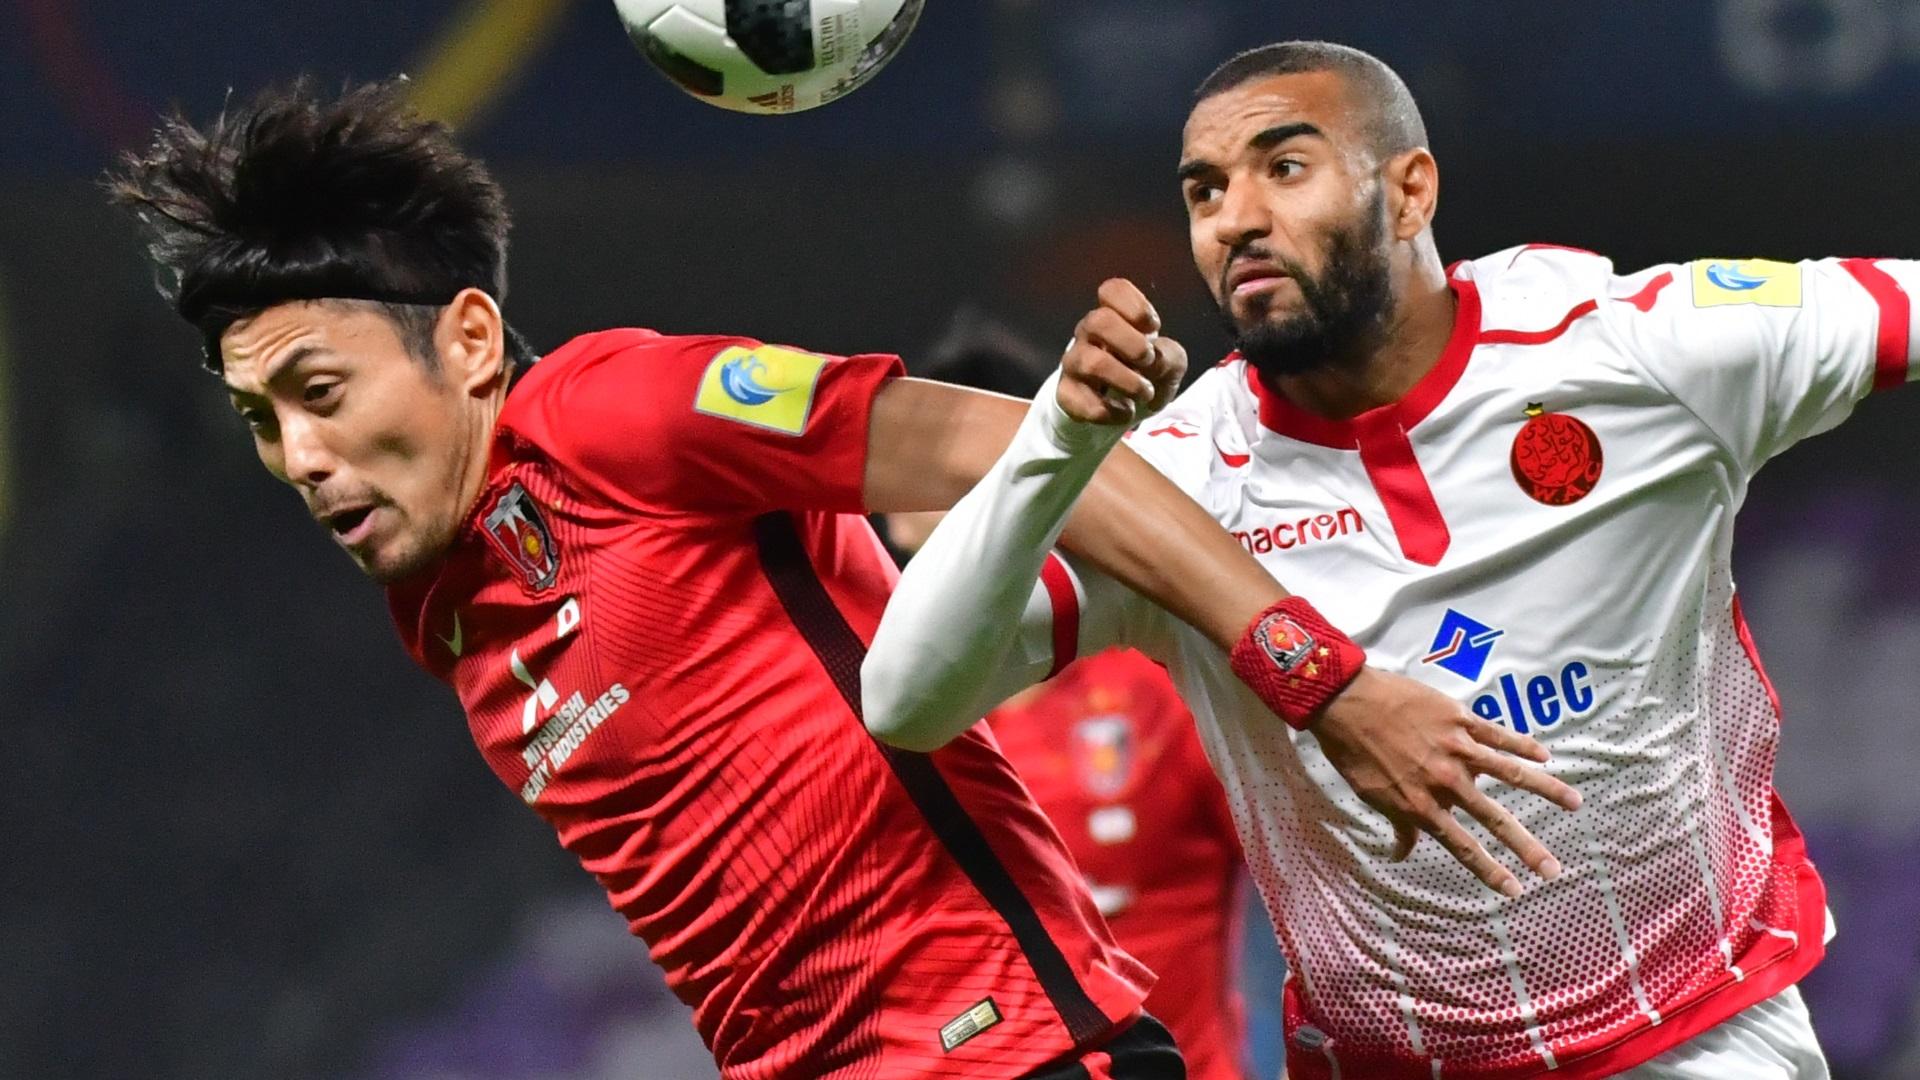 Ismail El Haddad of Wydad Casablanca and Ryota Moriwaki of Urawa Reds